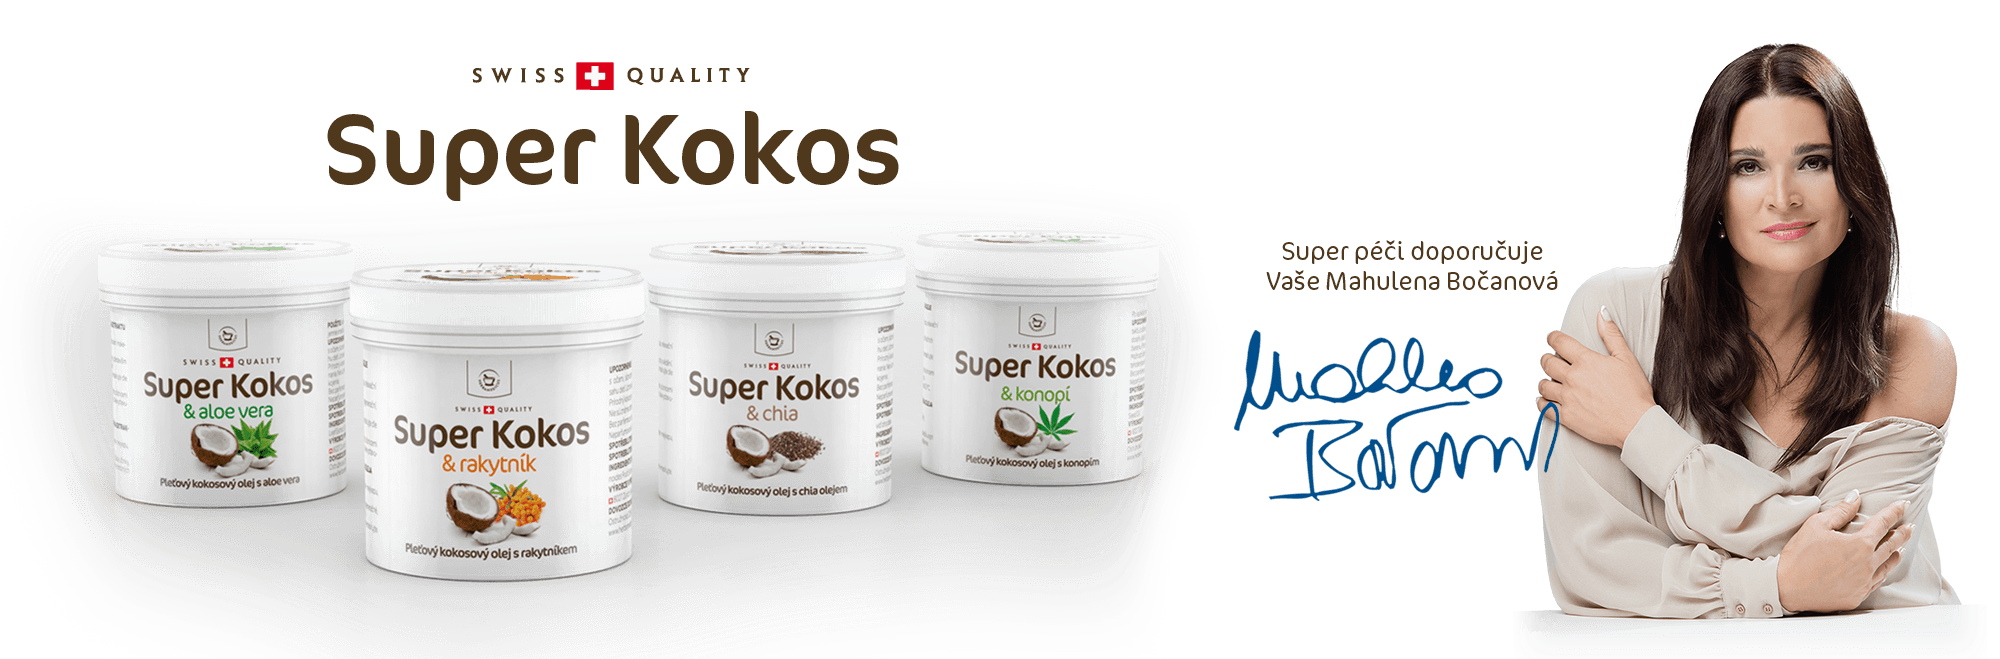 Banner - Super Kokos